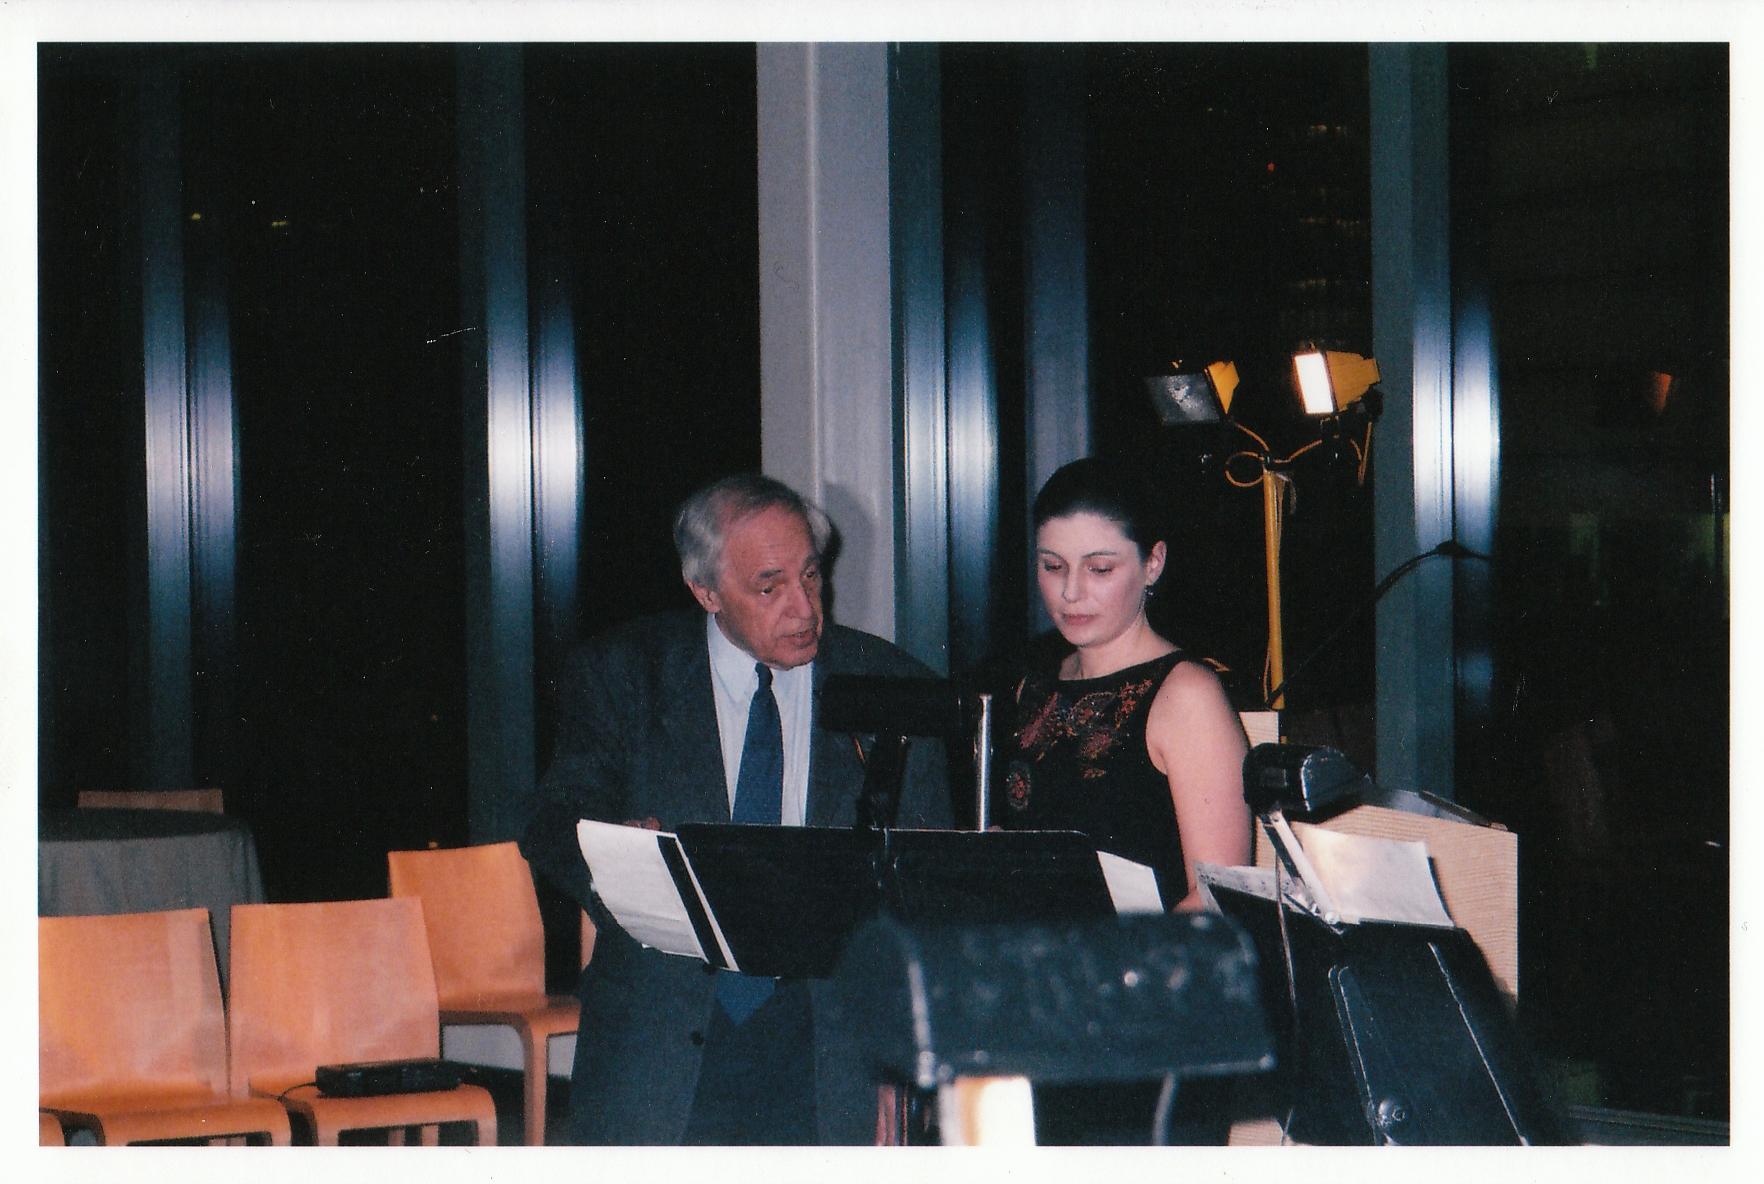 With Pierre Boulez